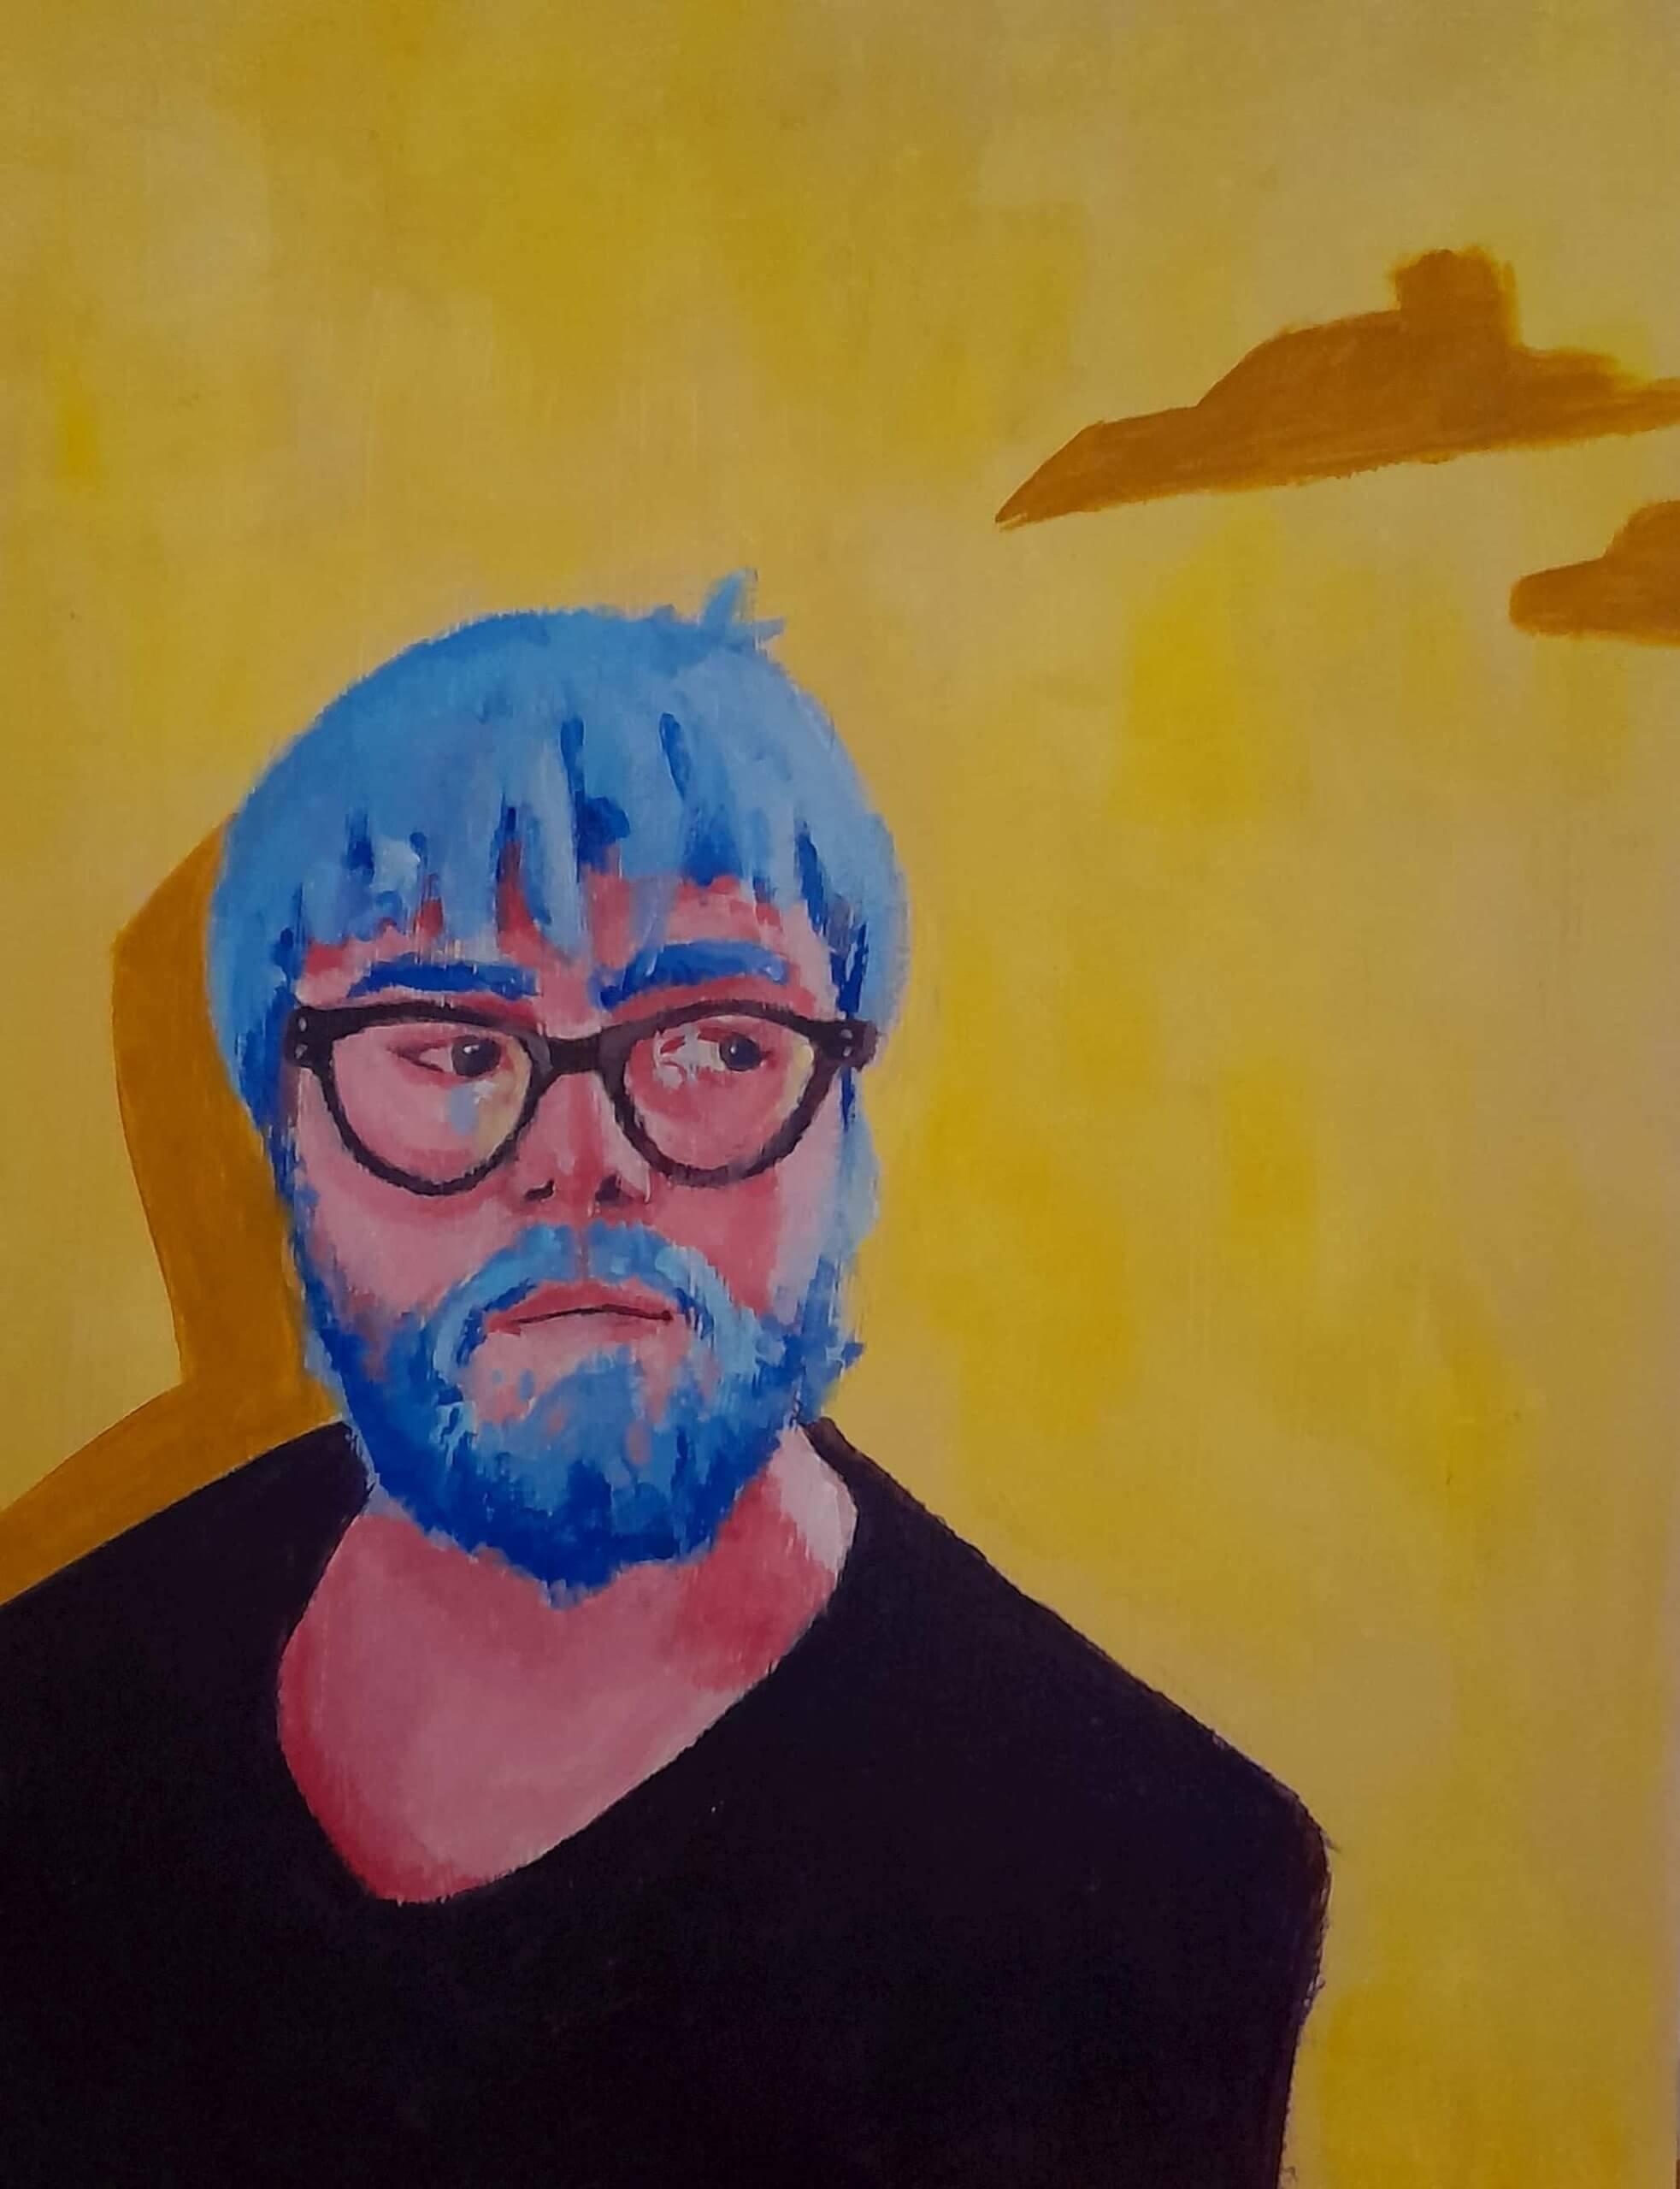 Ingmar Herrmann Porträt Leipzig Kunst